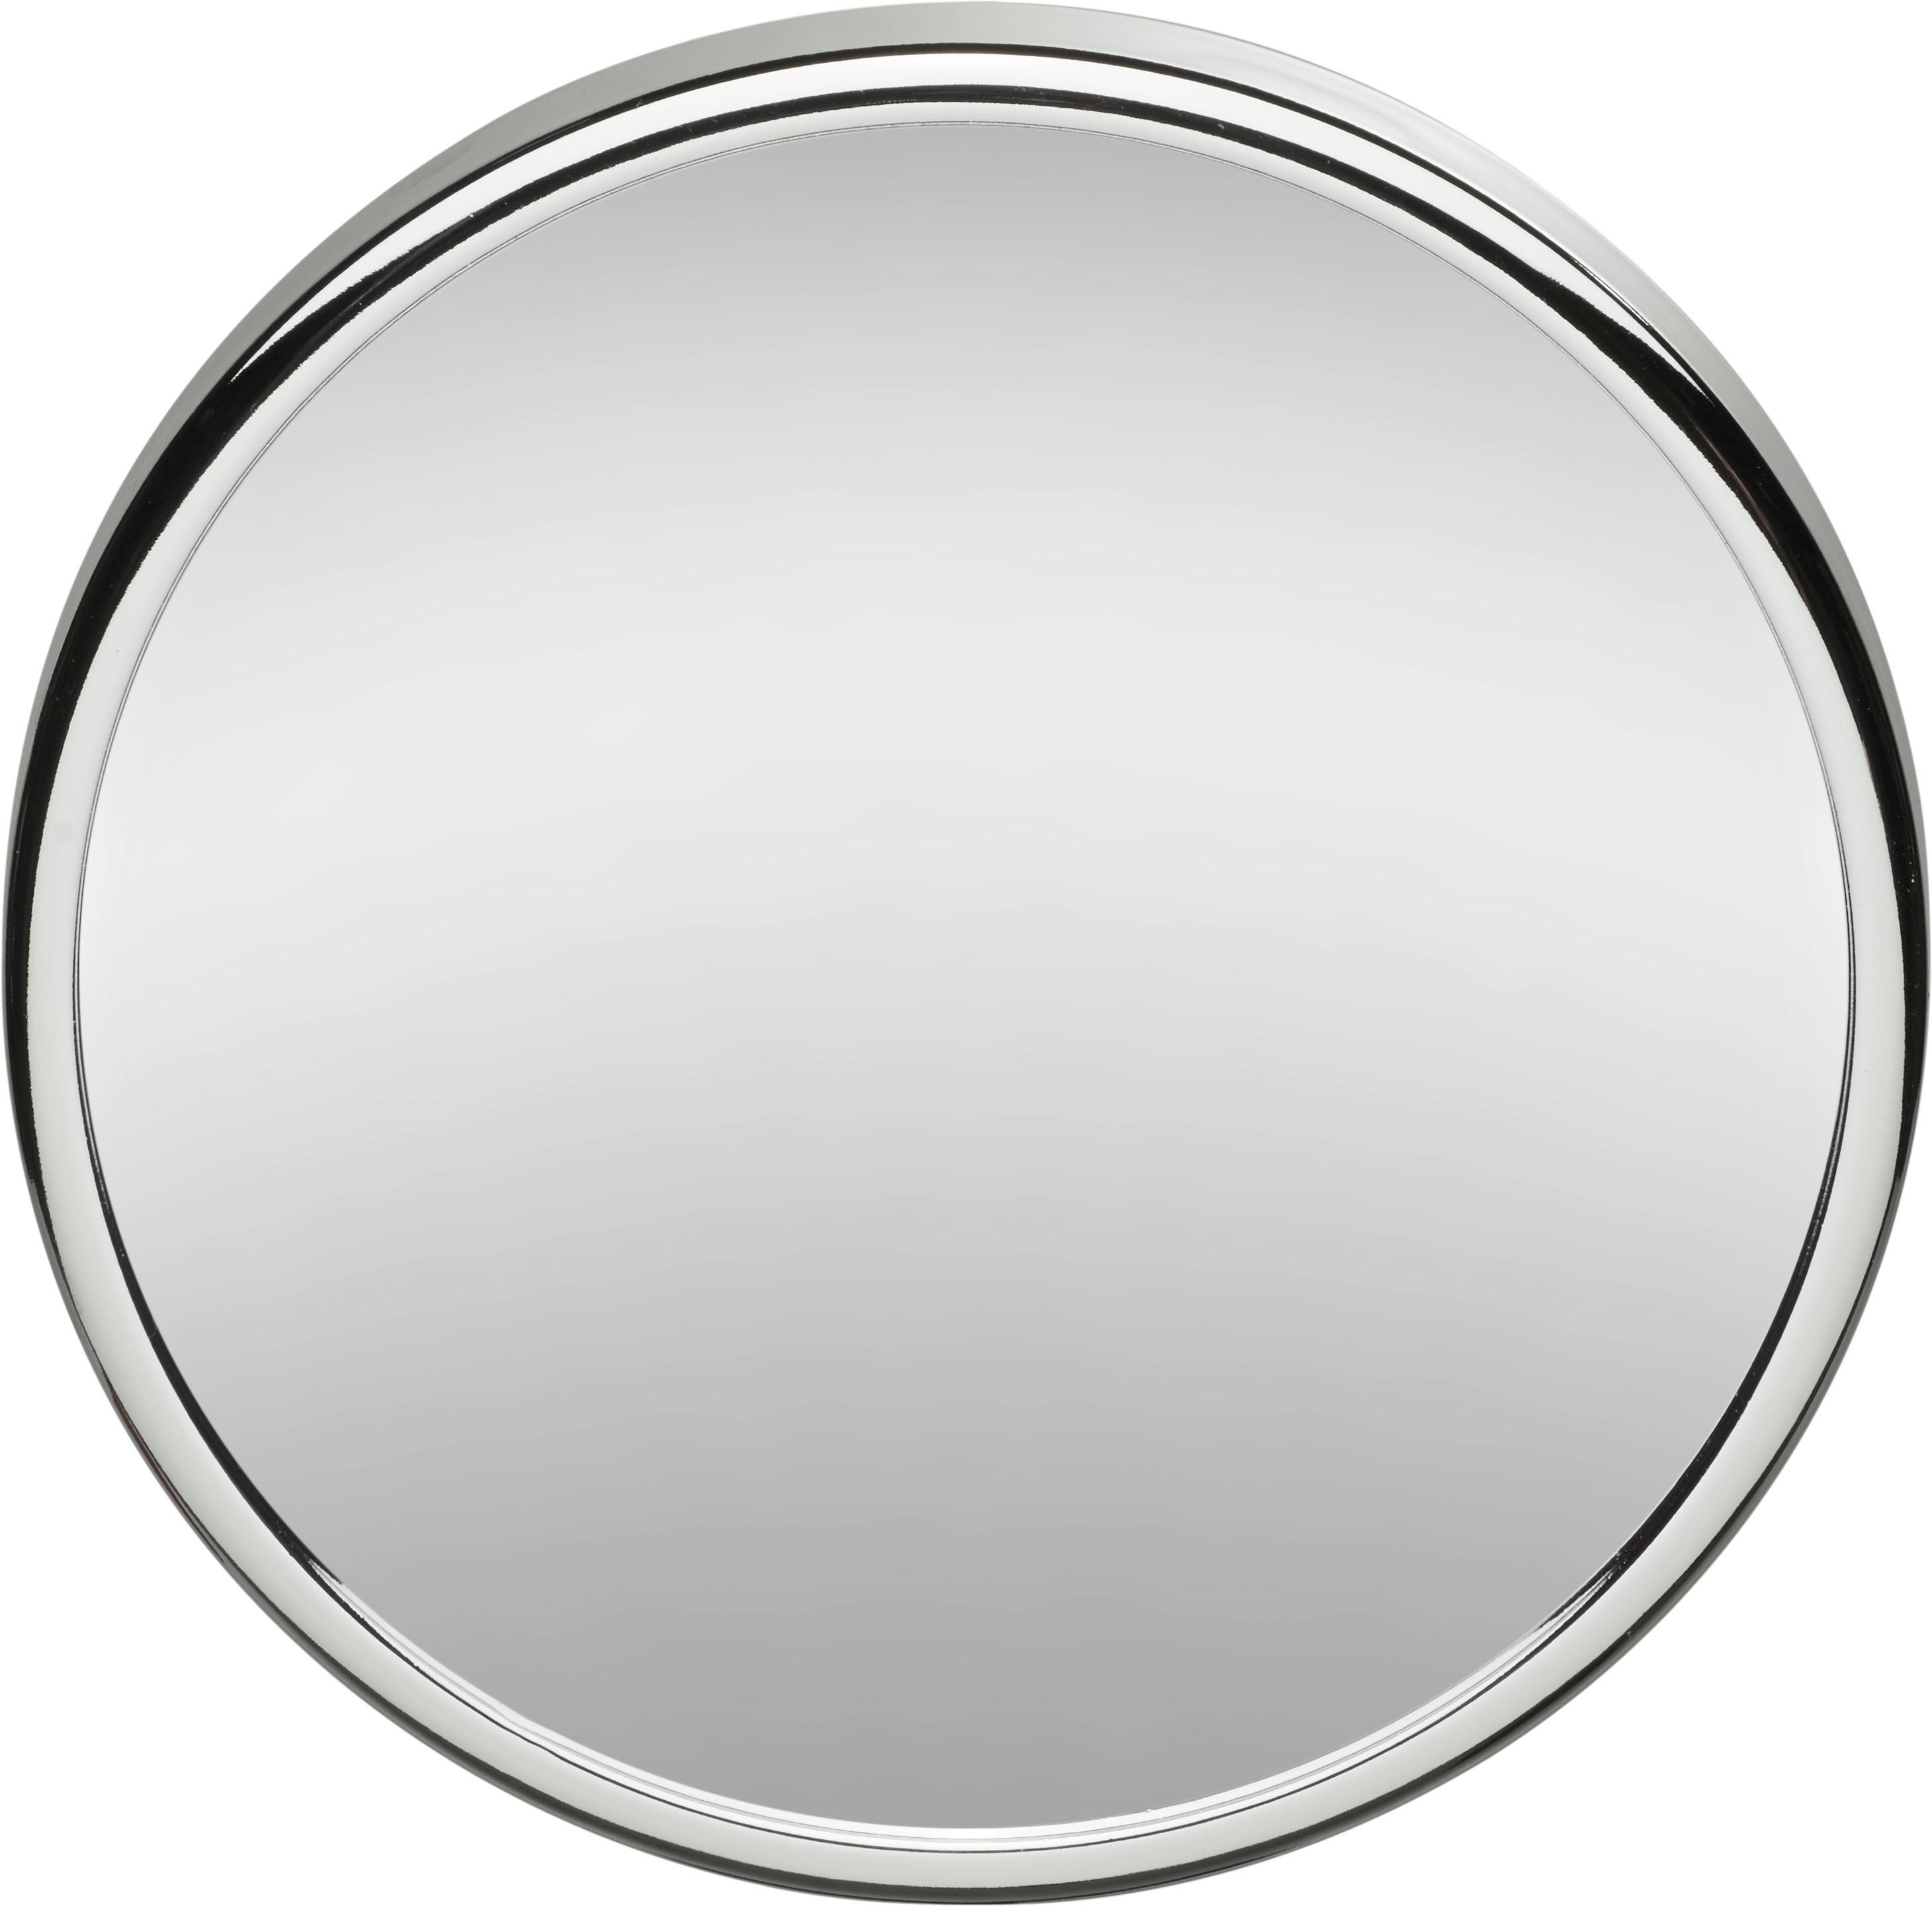 Kosmetikspiegel ca. 13cm - Chromfarben, Glas/Kunststoff (13/13/2,5cm) - MÖMAX modern living